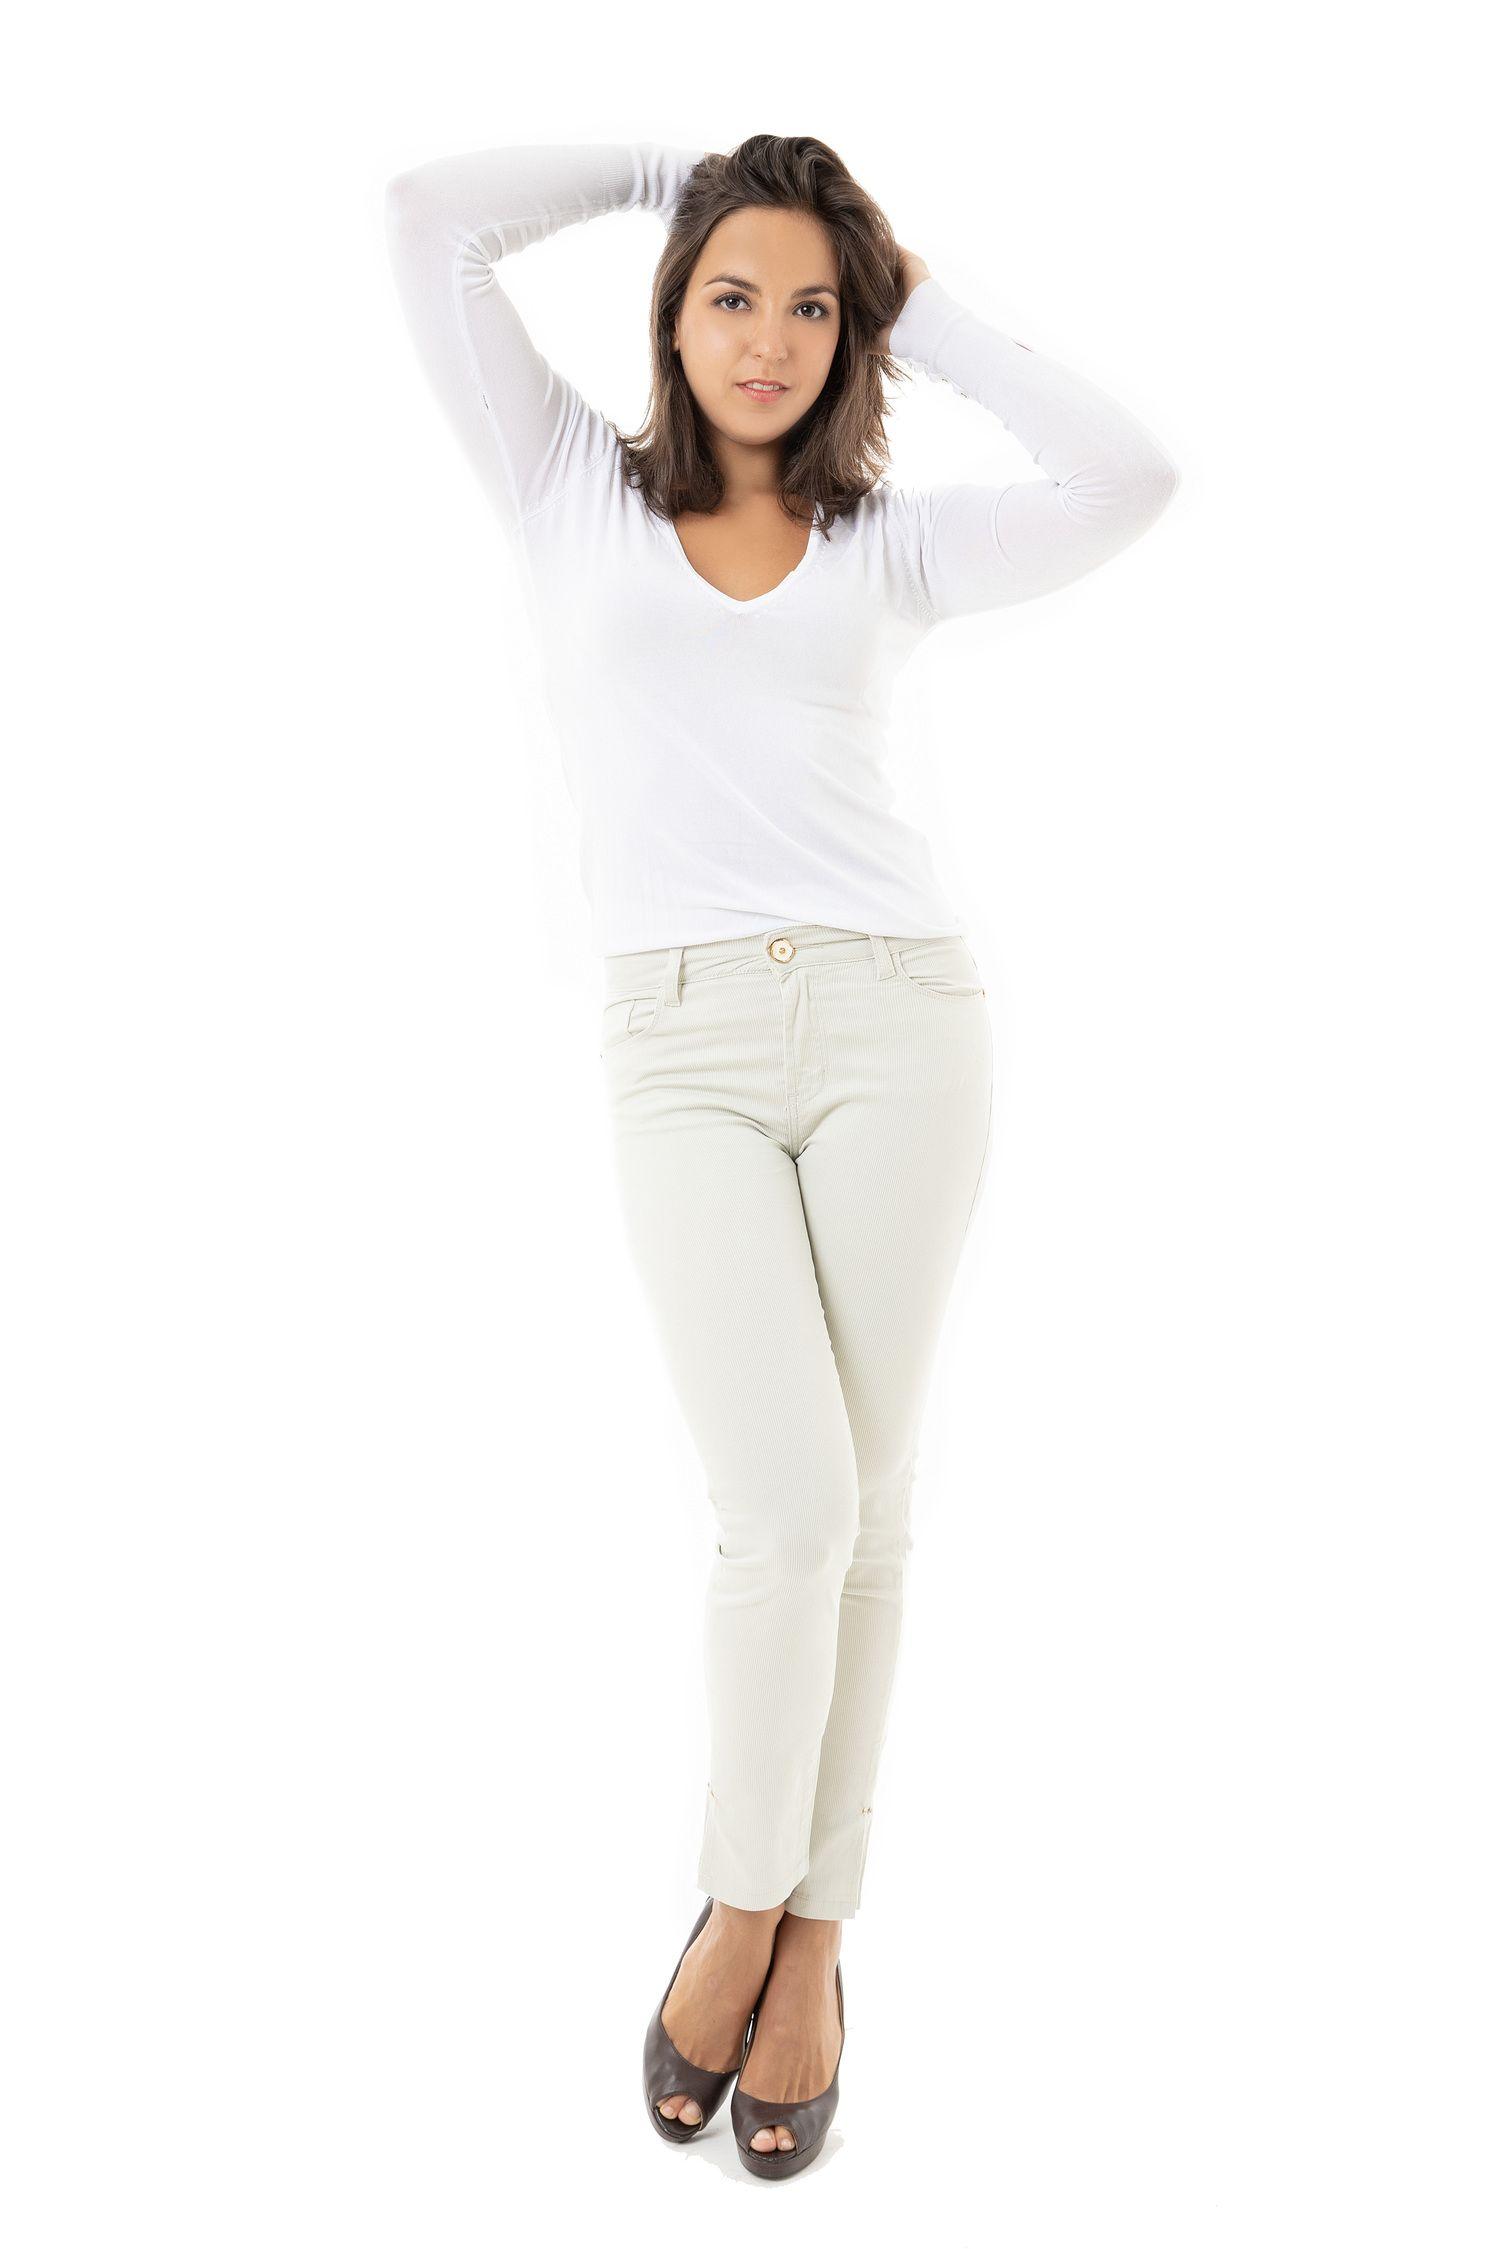 Calça Cropped Feminina Fact Jeans ref. 03712 - Areia